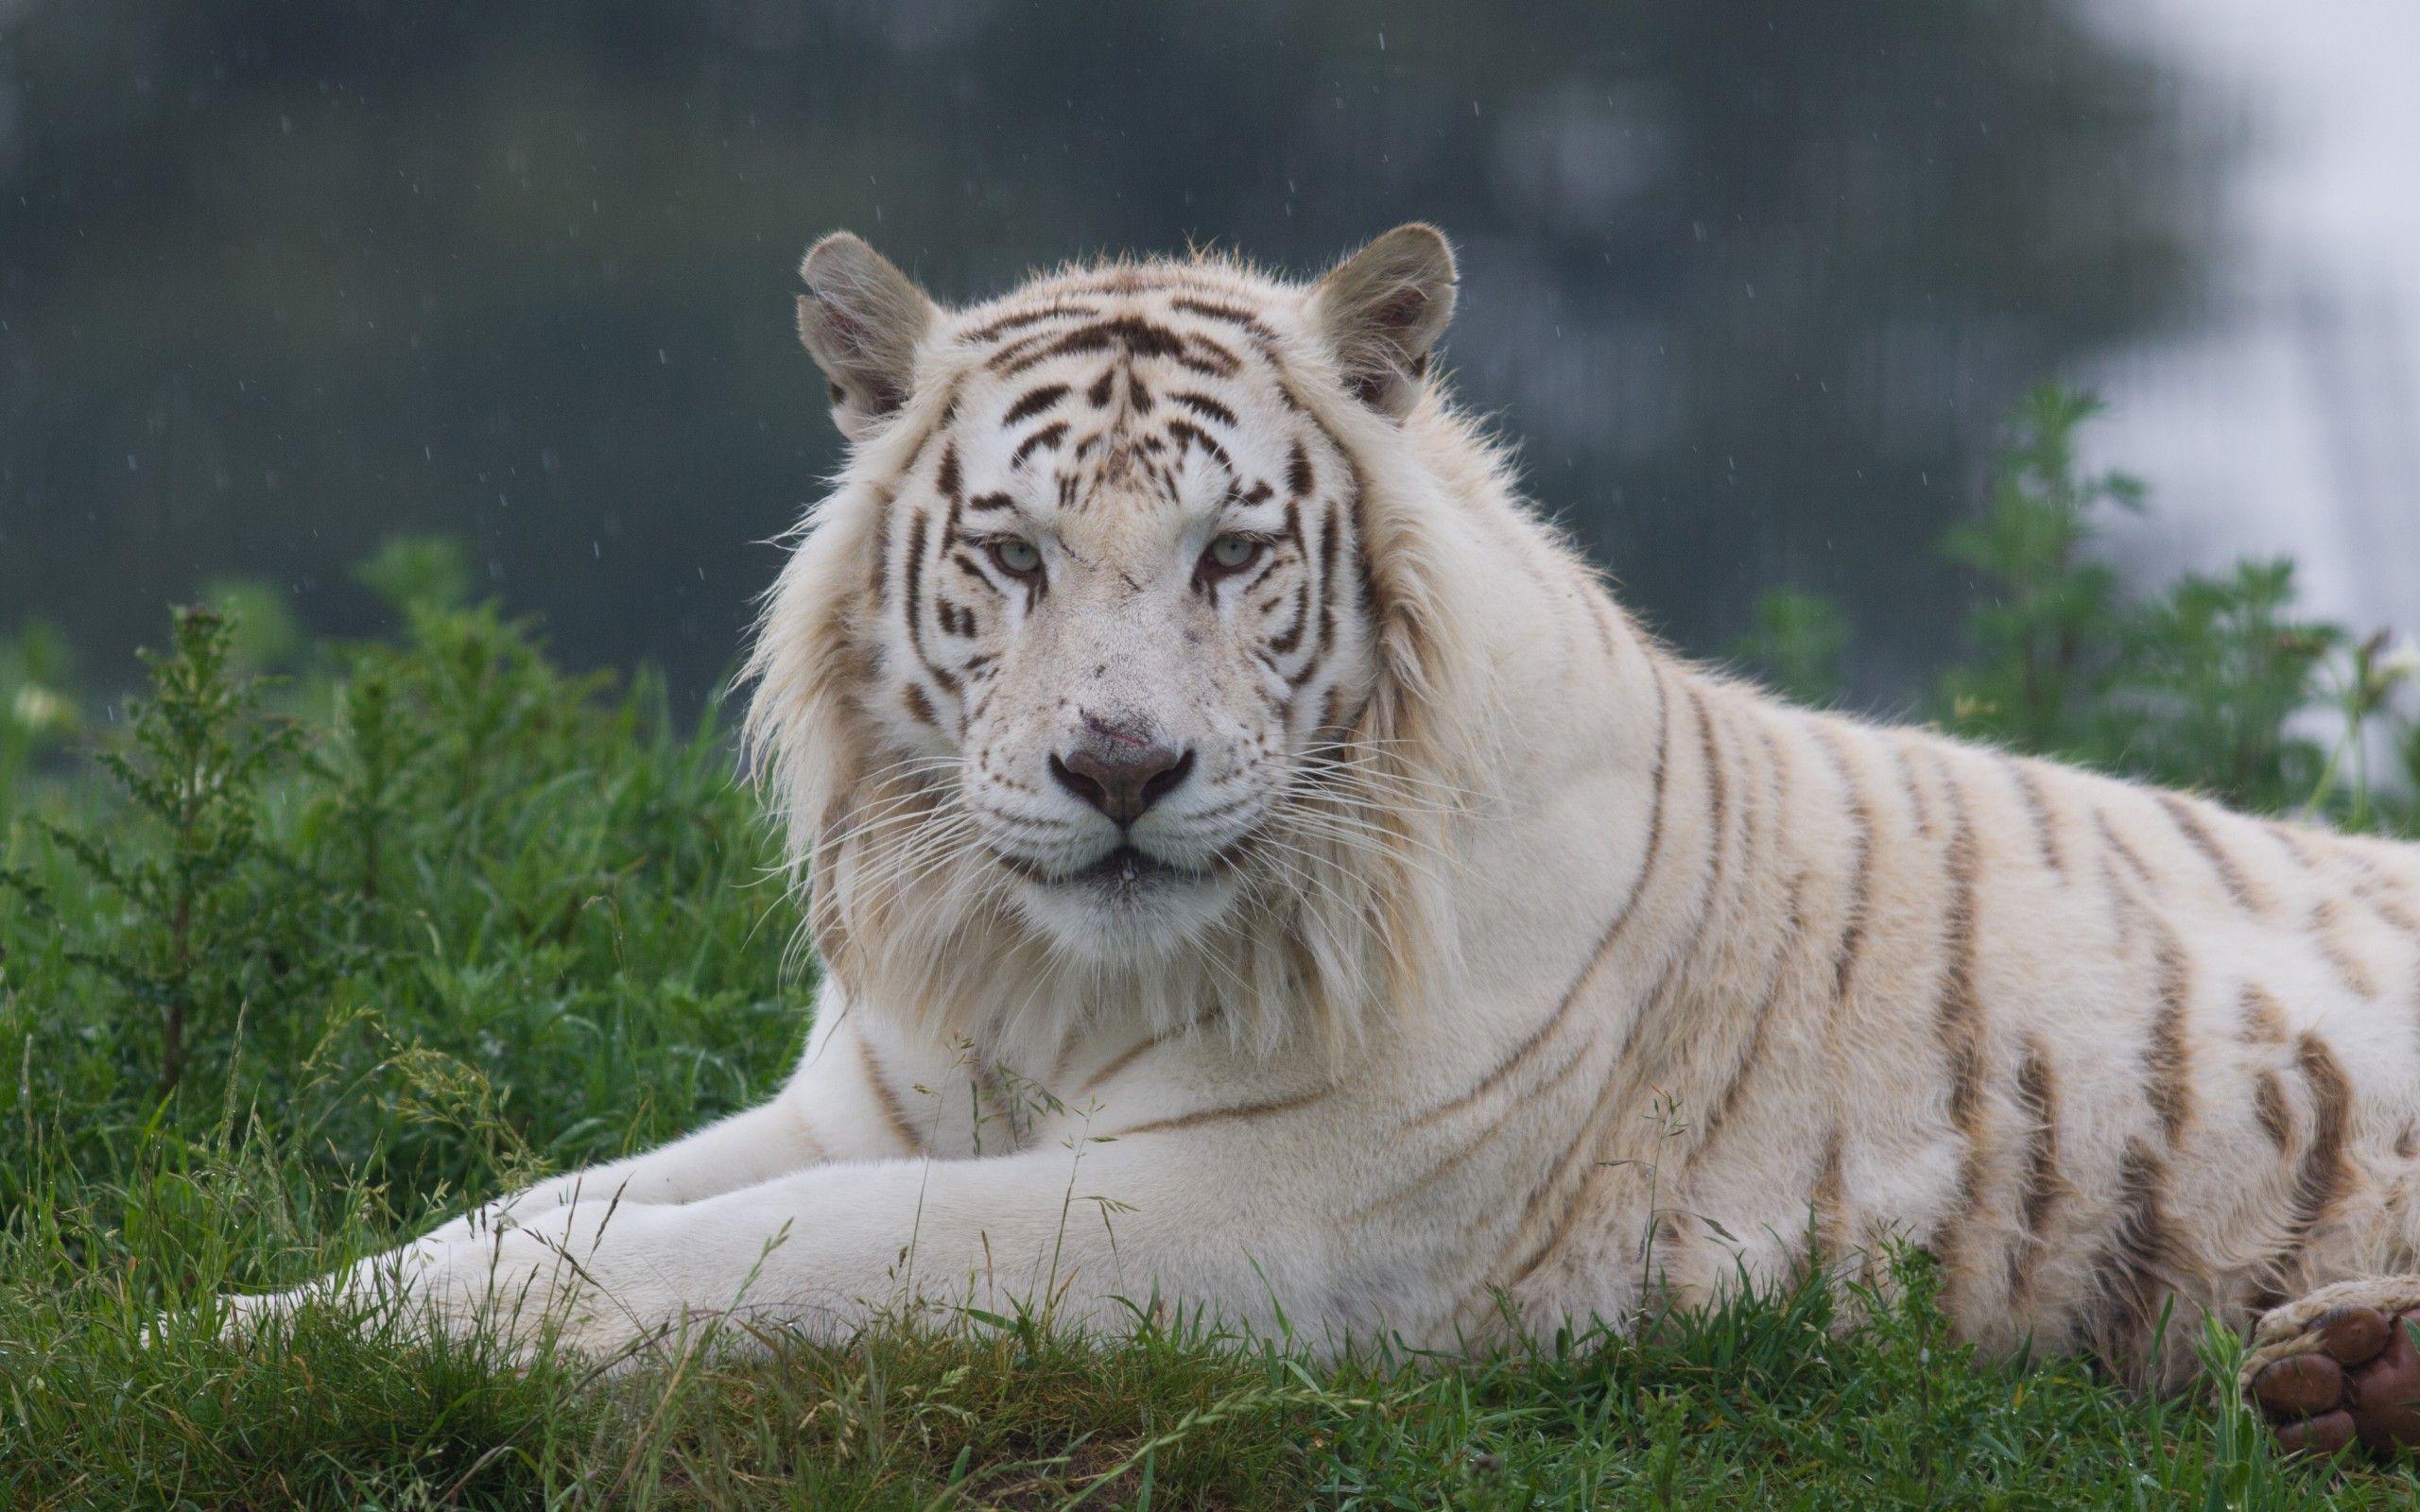 Tigre Blanc Fonds D Ecran Arrieres Plan 2560x1600 Id 529714 Tigre Blanc Fond D Ecran Pour Ordinateur Fond Ecran